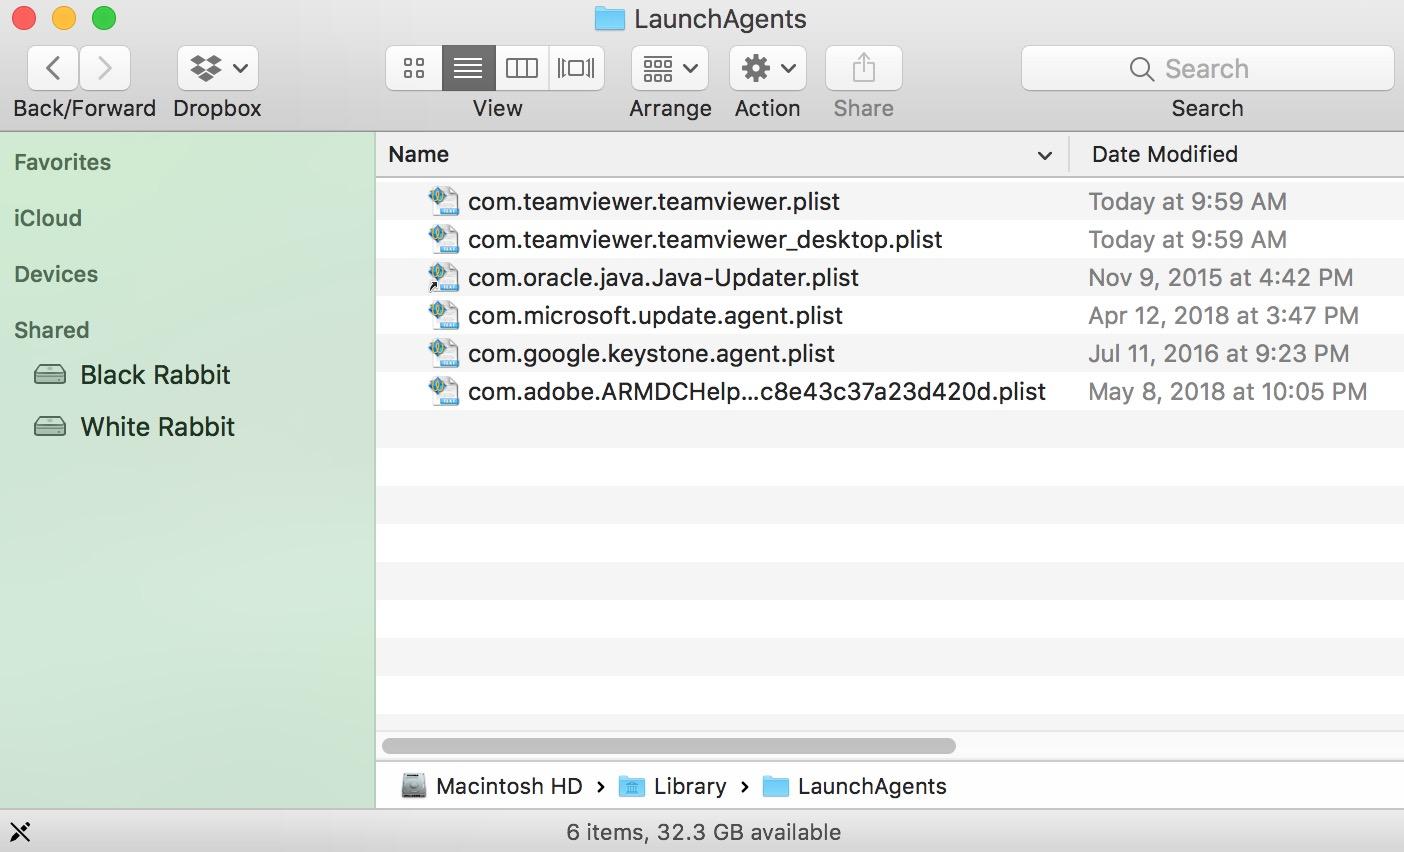 Contents of LaunchAgents folder in macOS